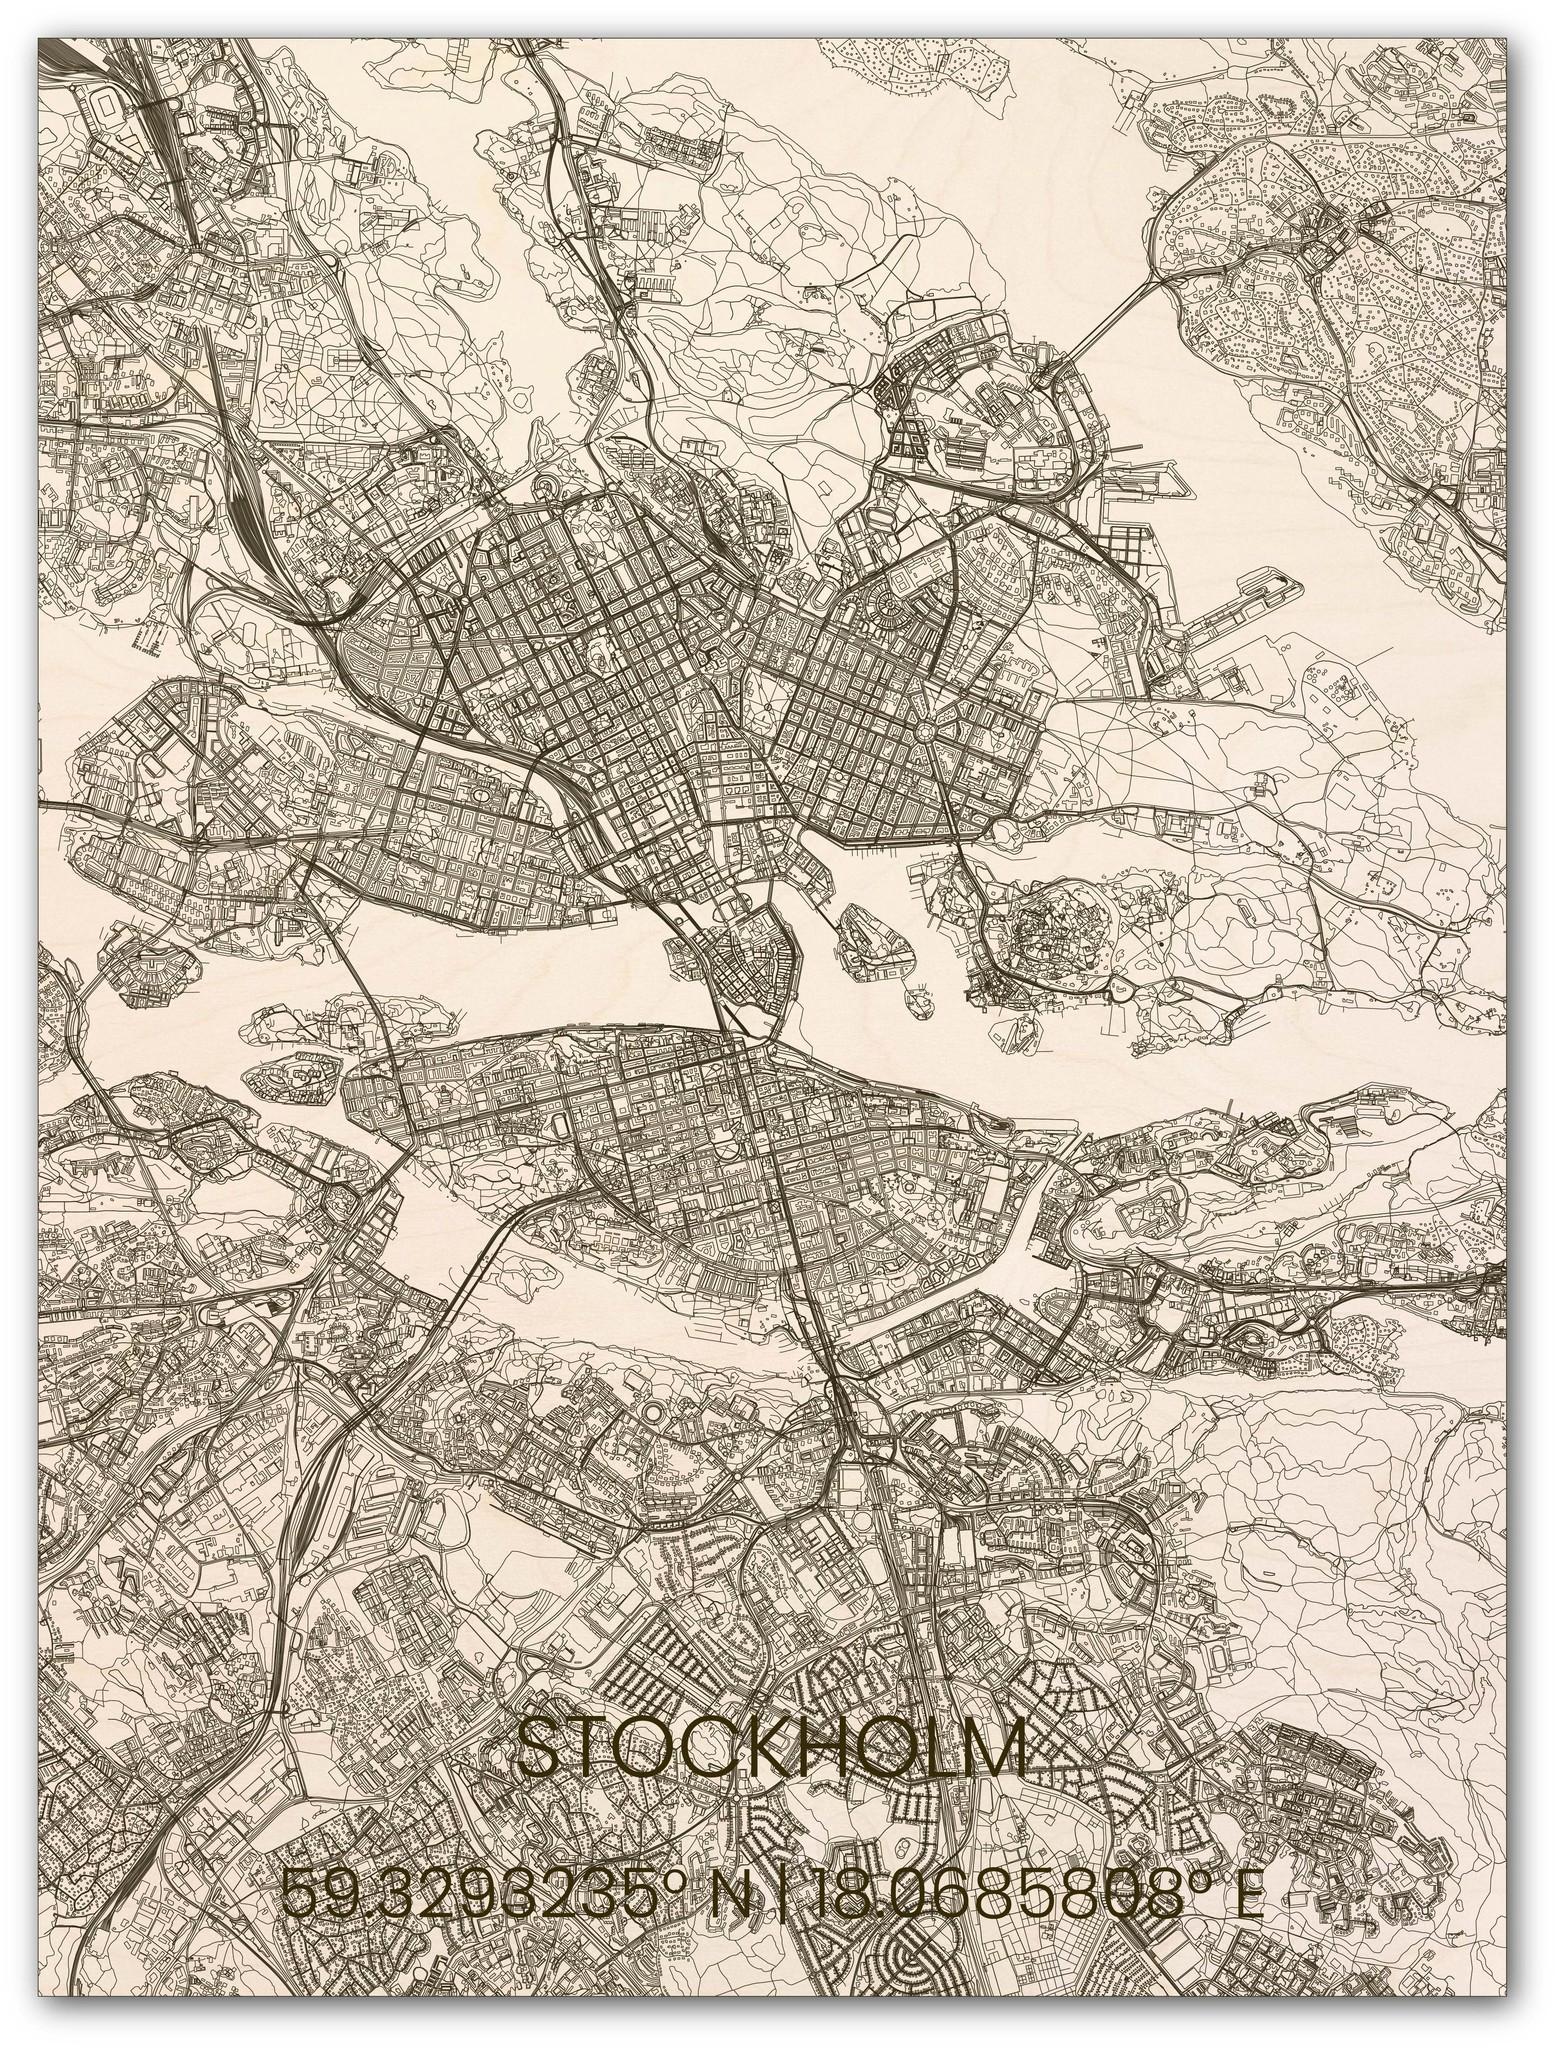 Houten stadsplattegrond Stockholm-1